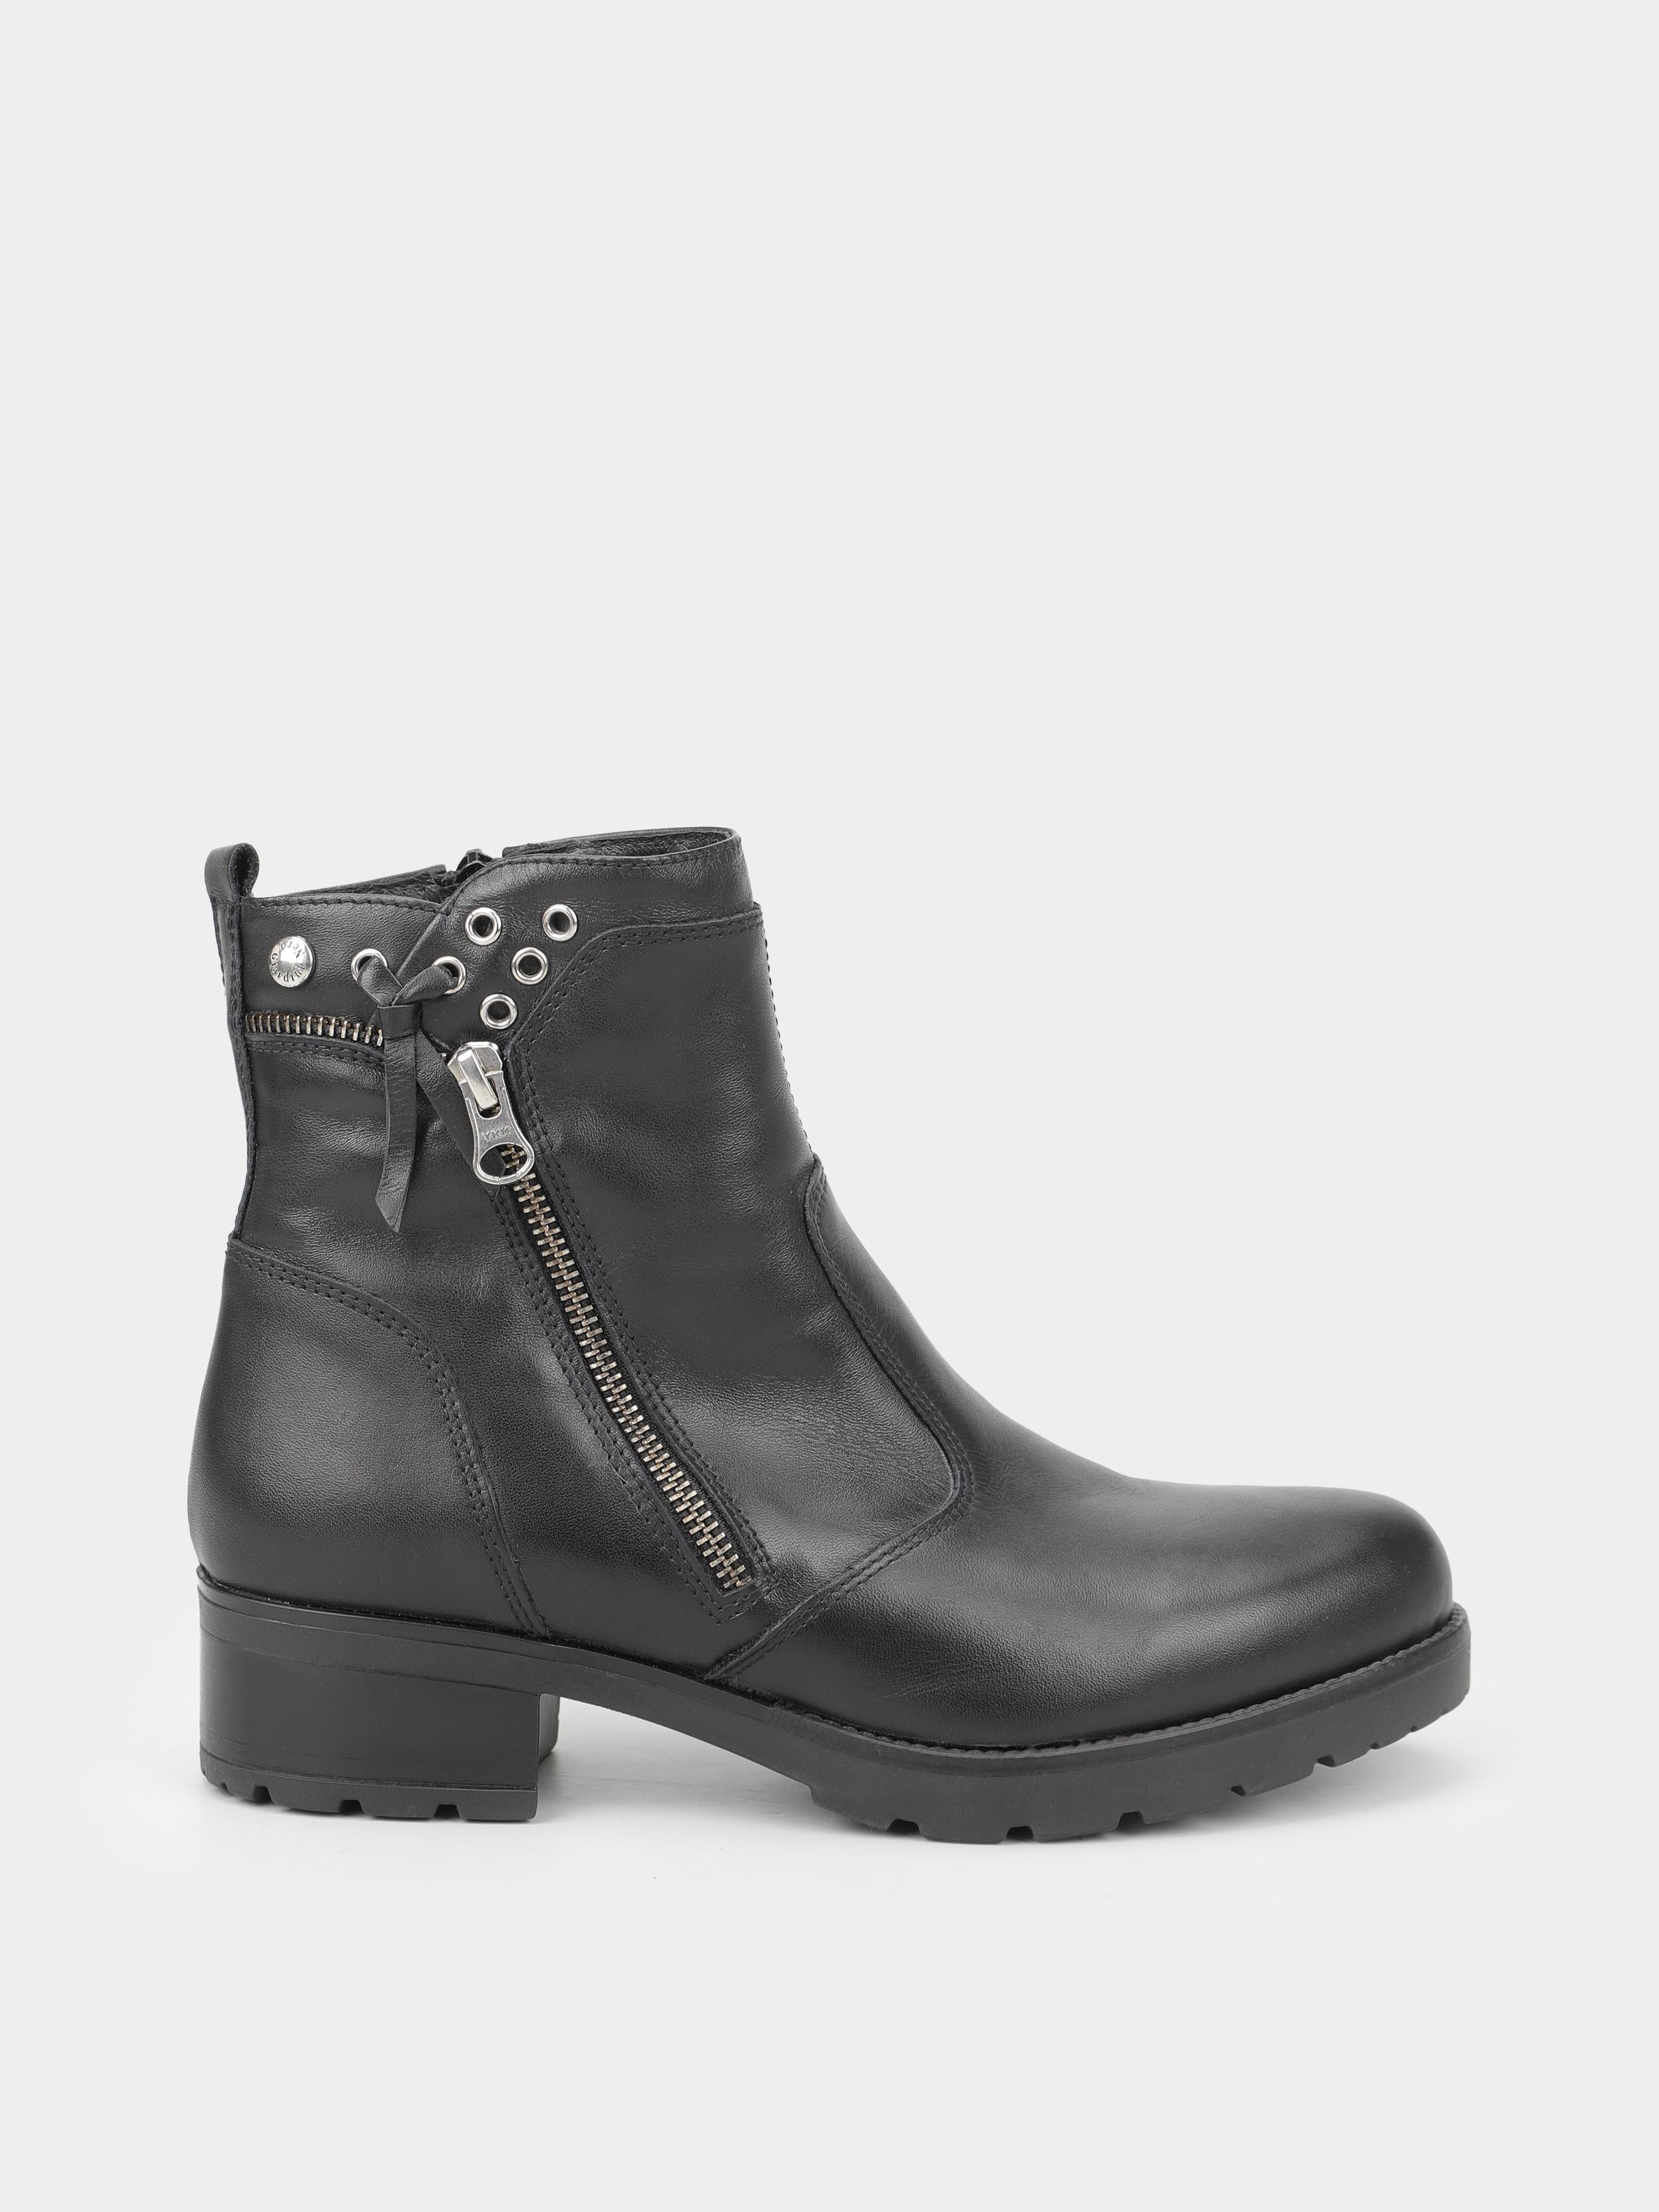 Ботинки женские NeroGiardini NM18 размерная сетка обуви, 2017